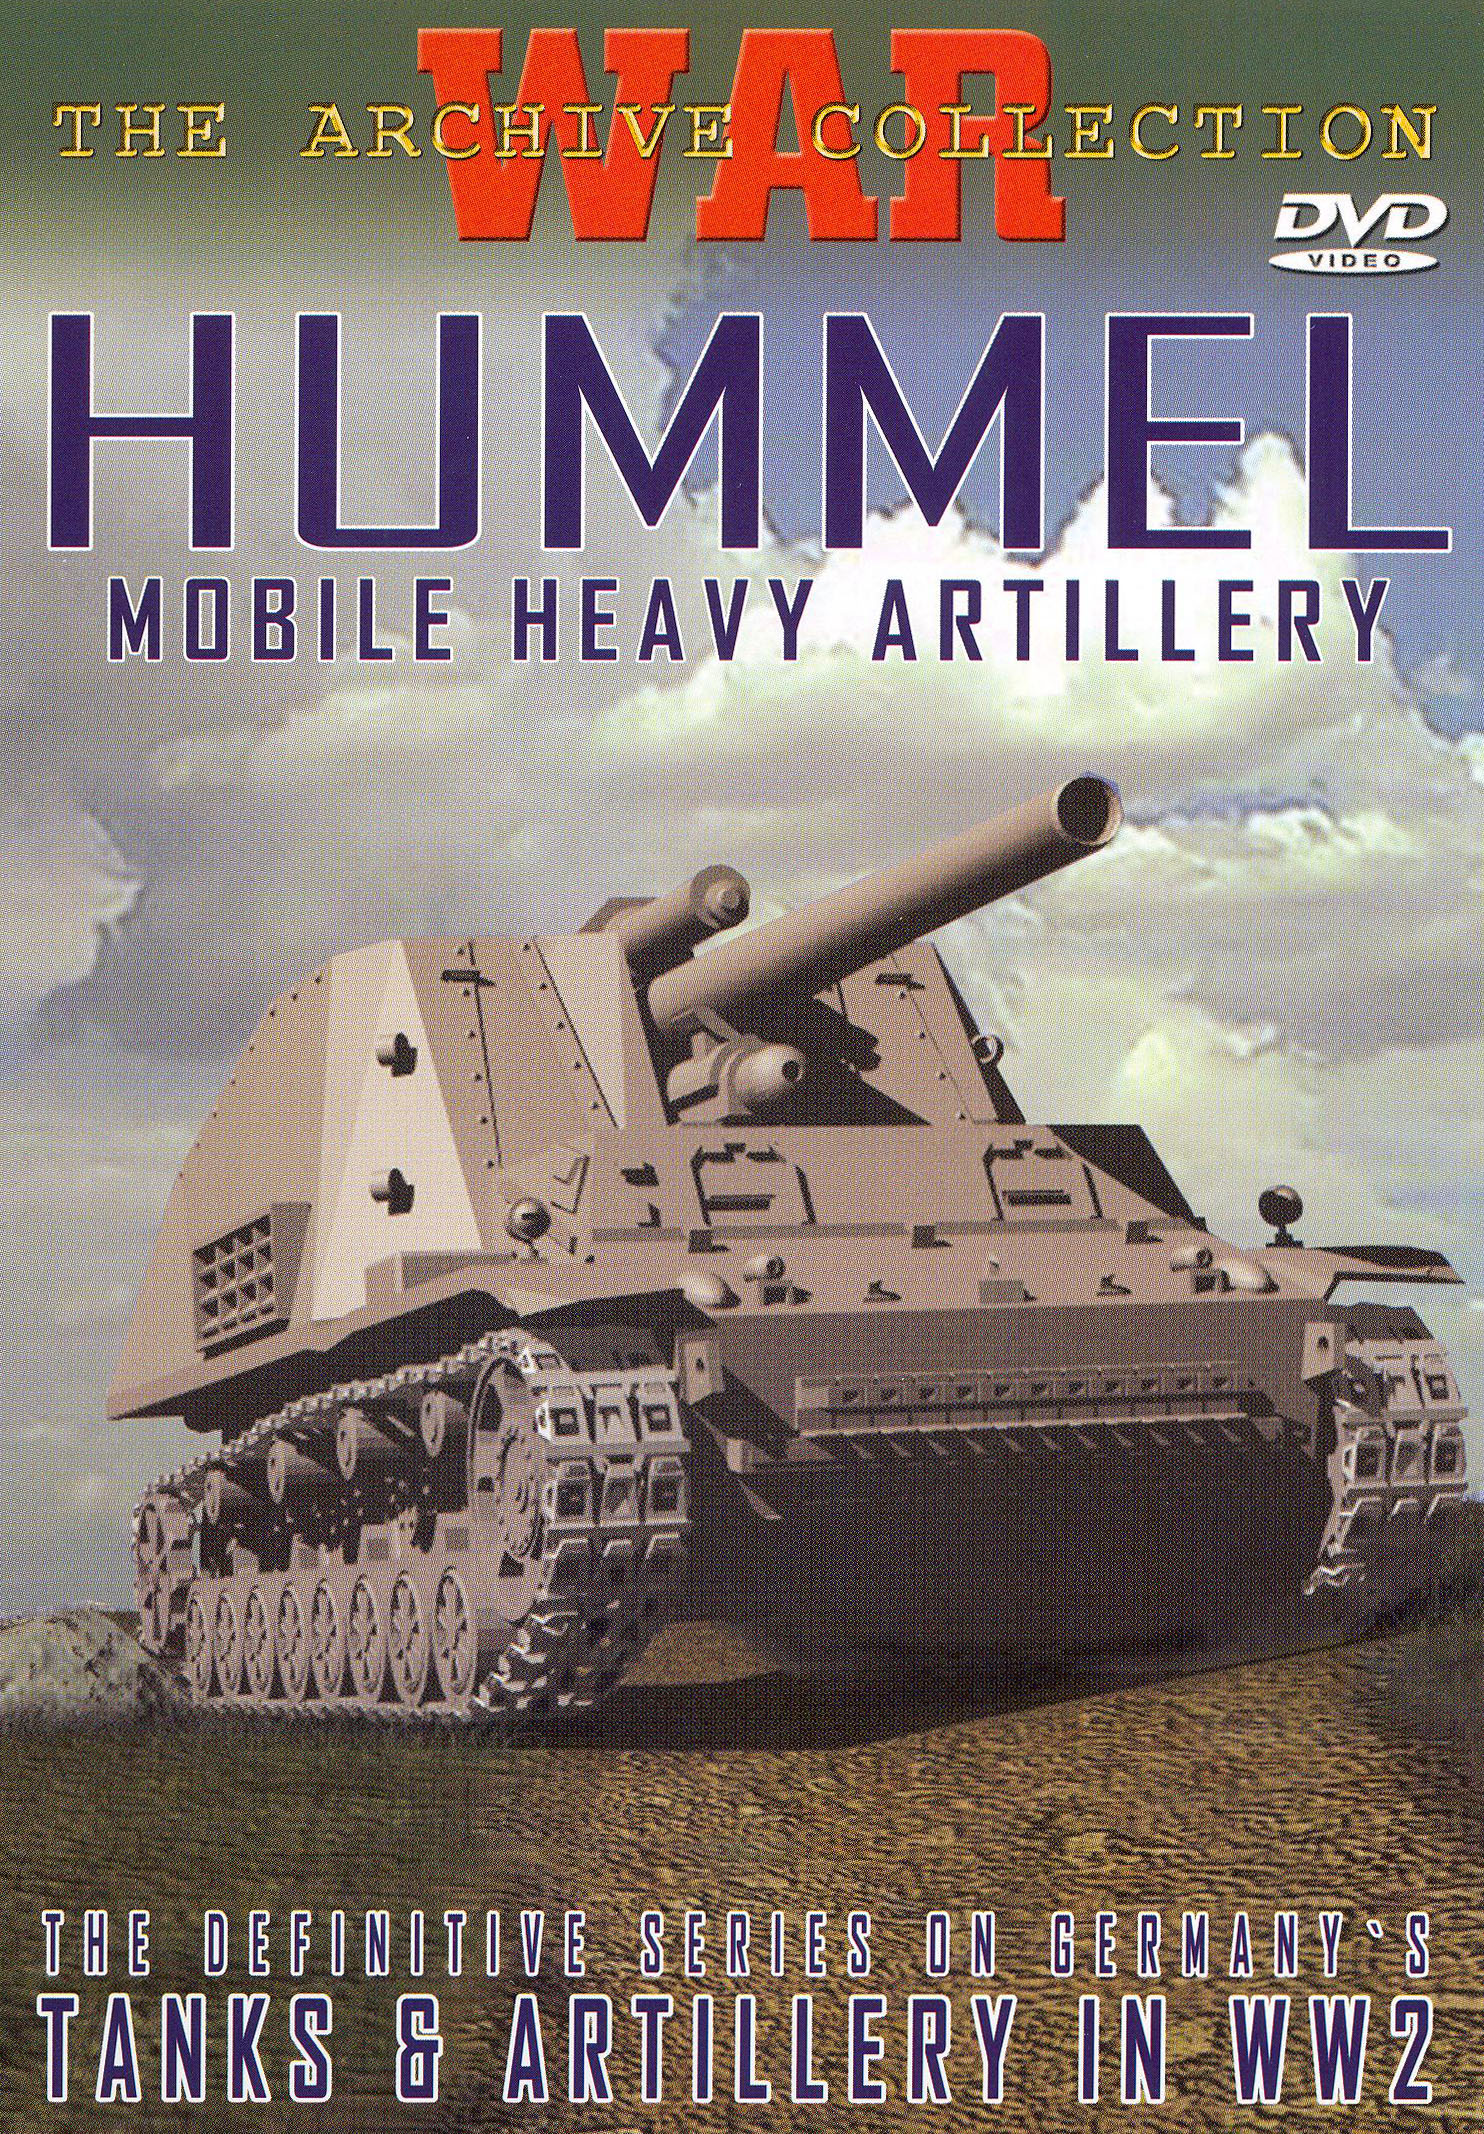 Hummel - Mobile Heavy Artillery